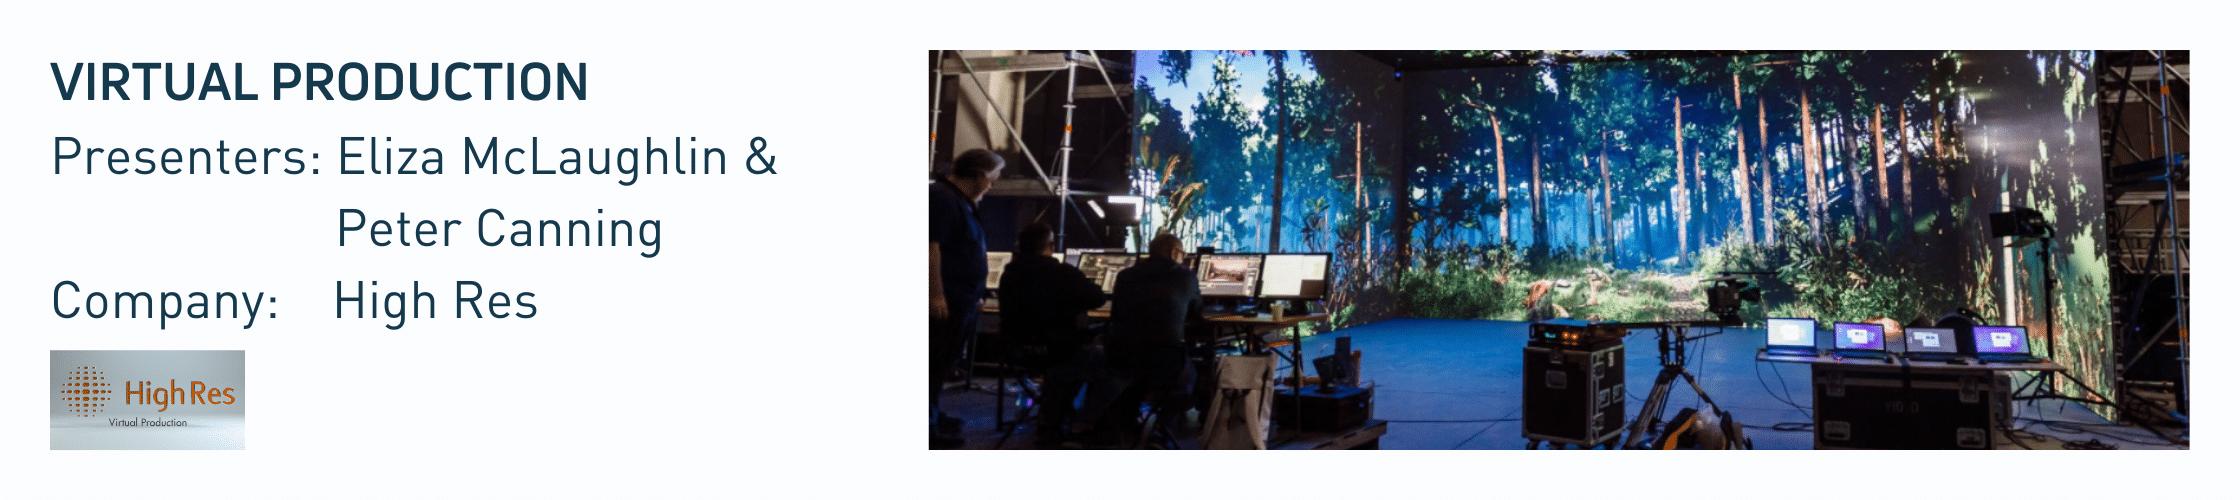 Immersive Technologies Skillnet Virtual Production Photo